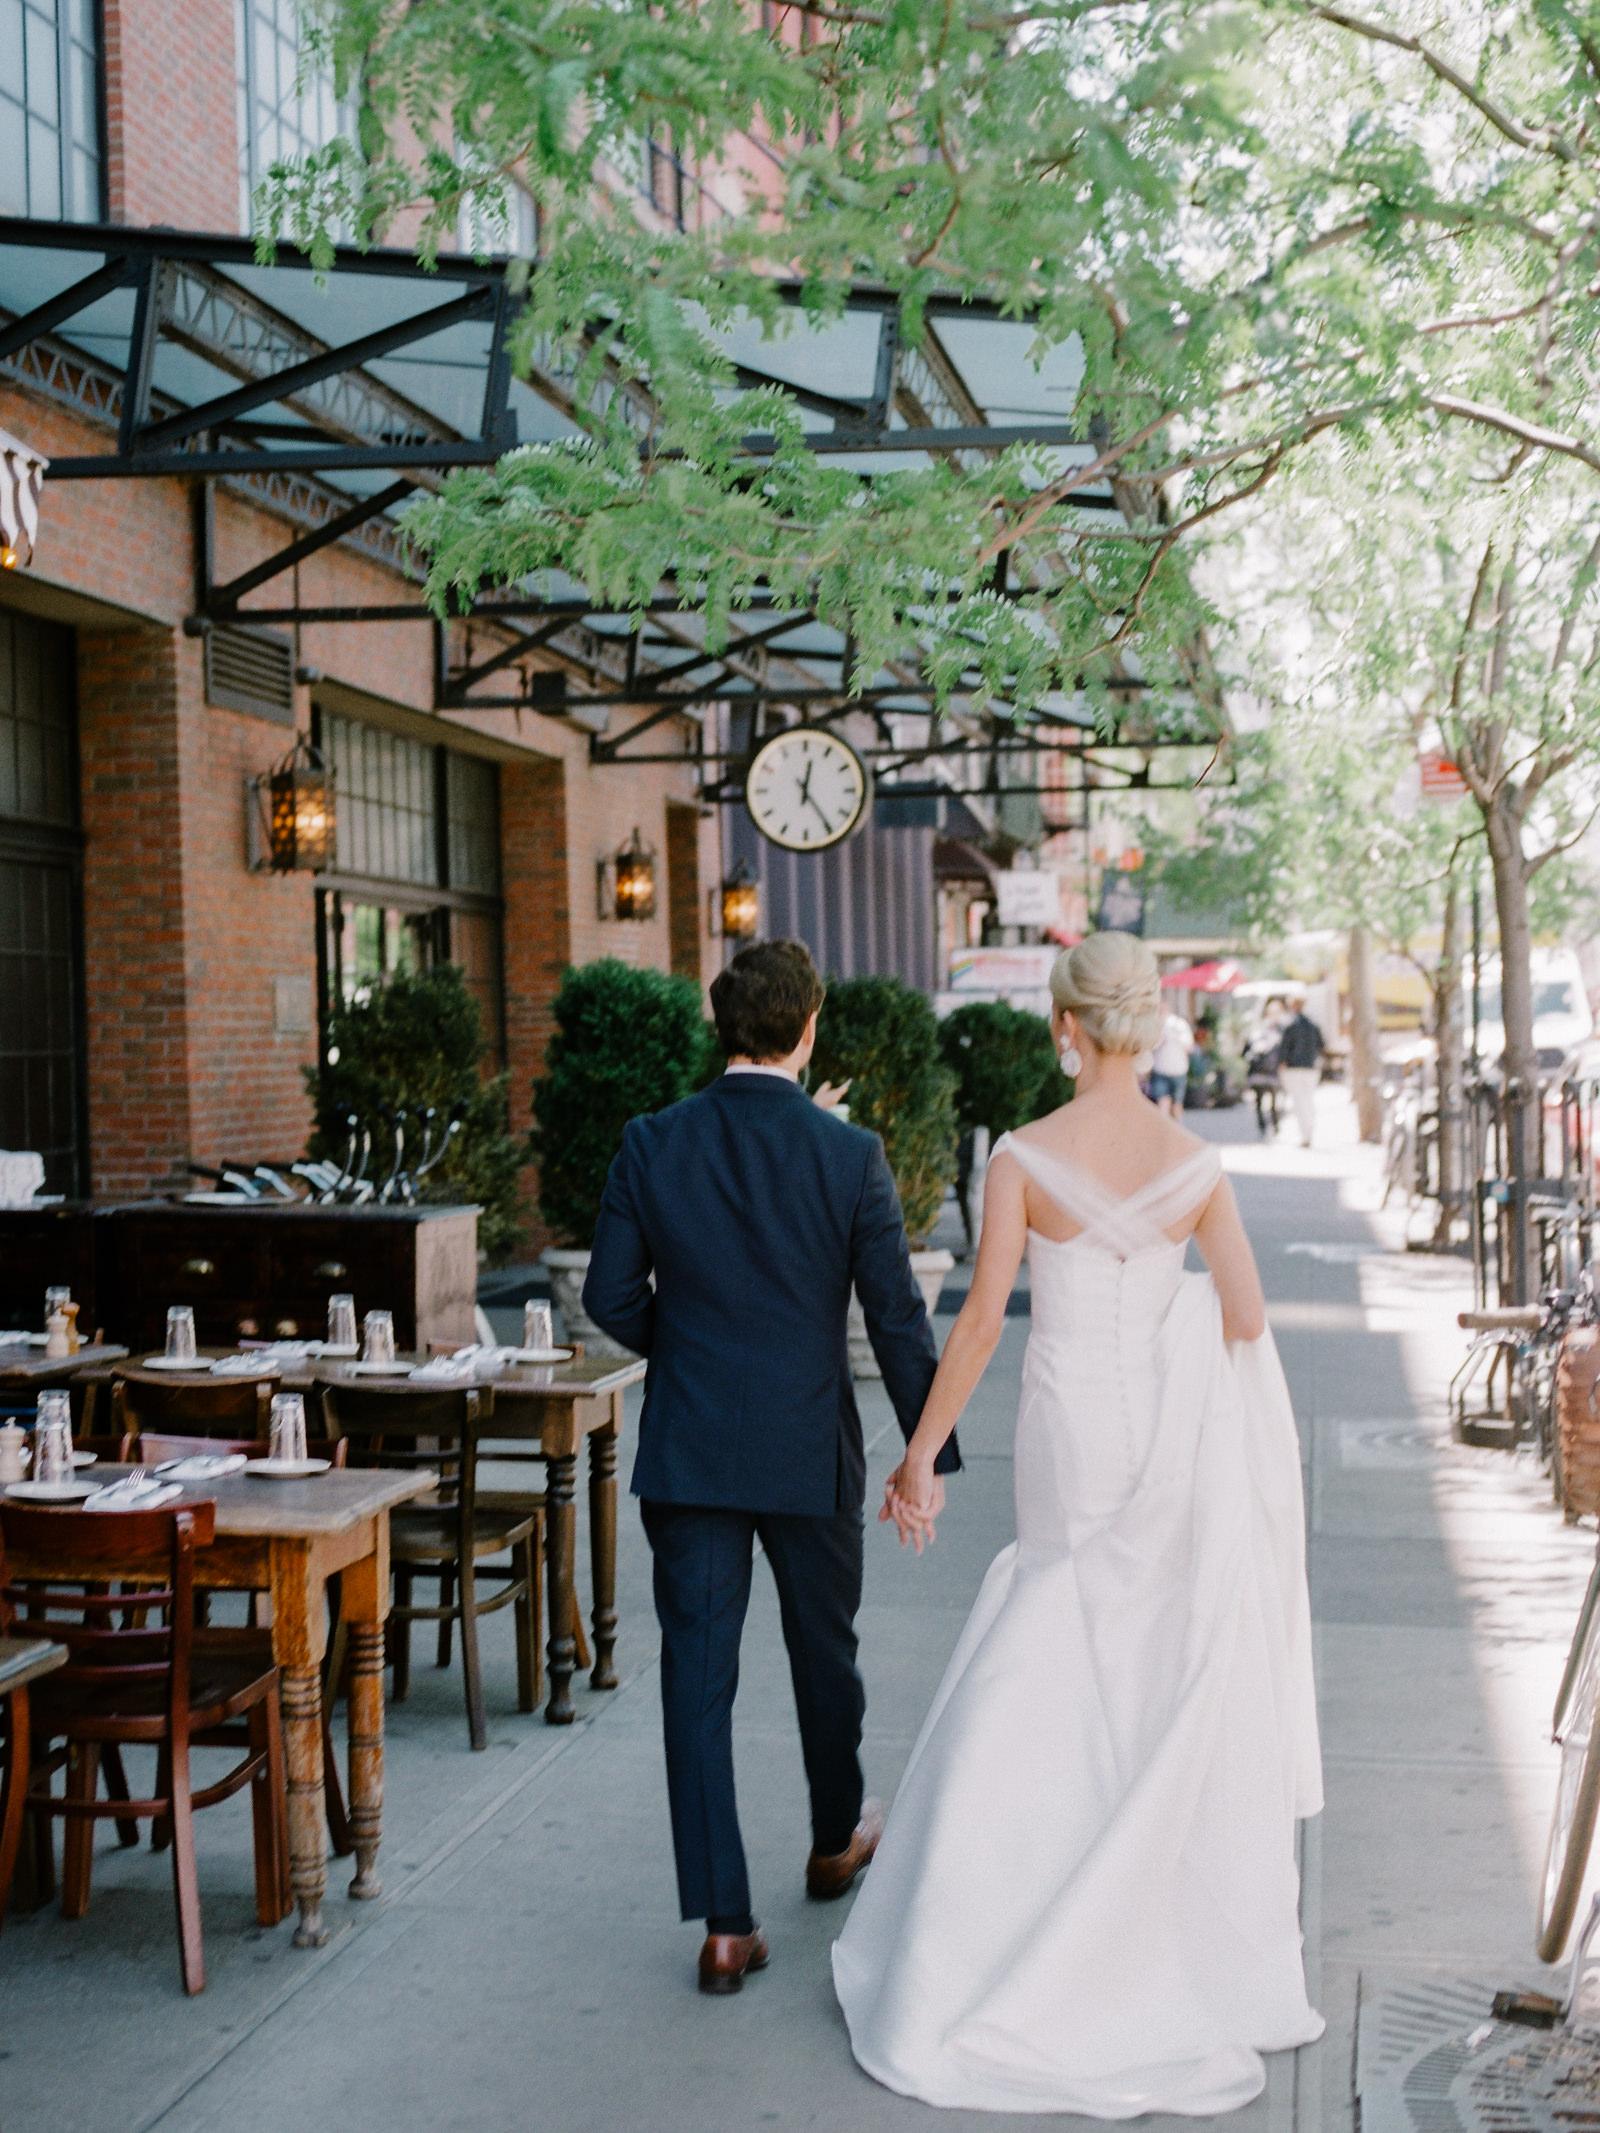 Intimate-NYC_wedding_ by Tanya Isaeva-93.jpg